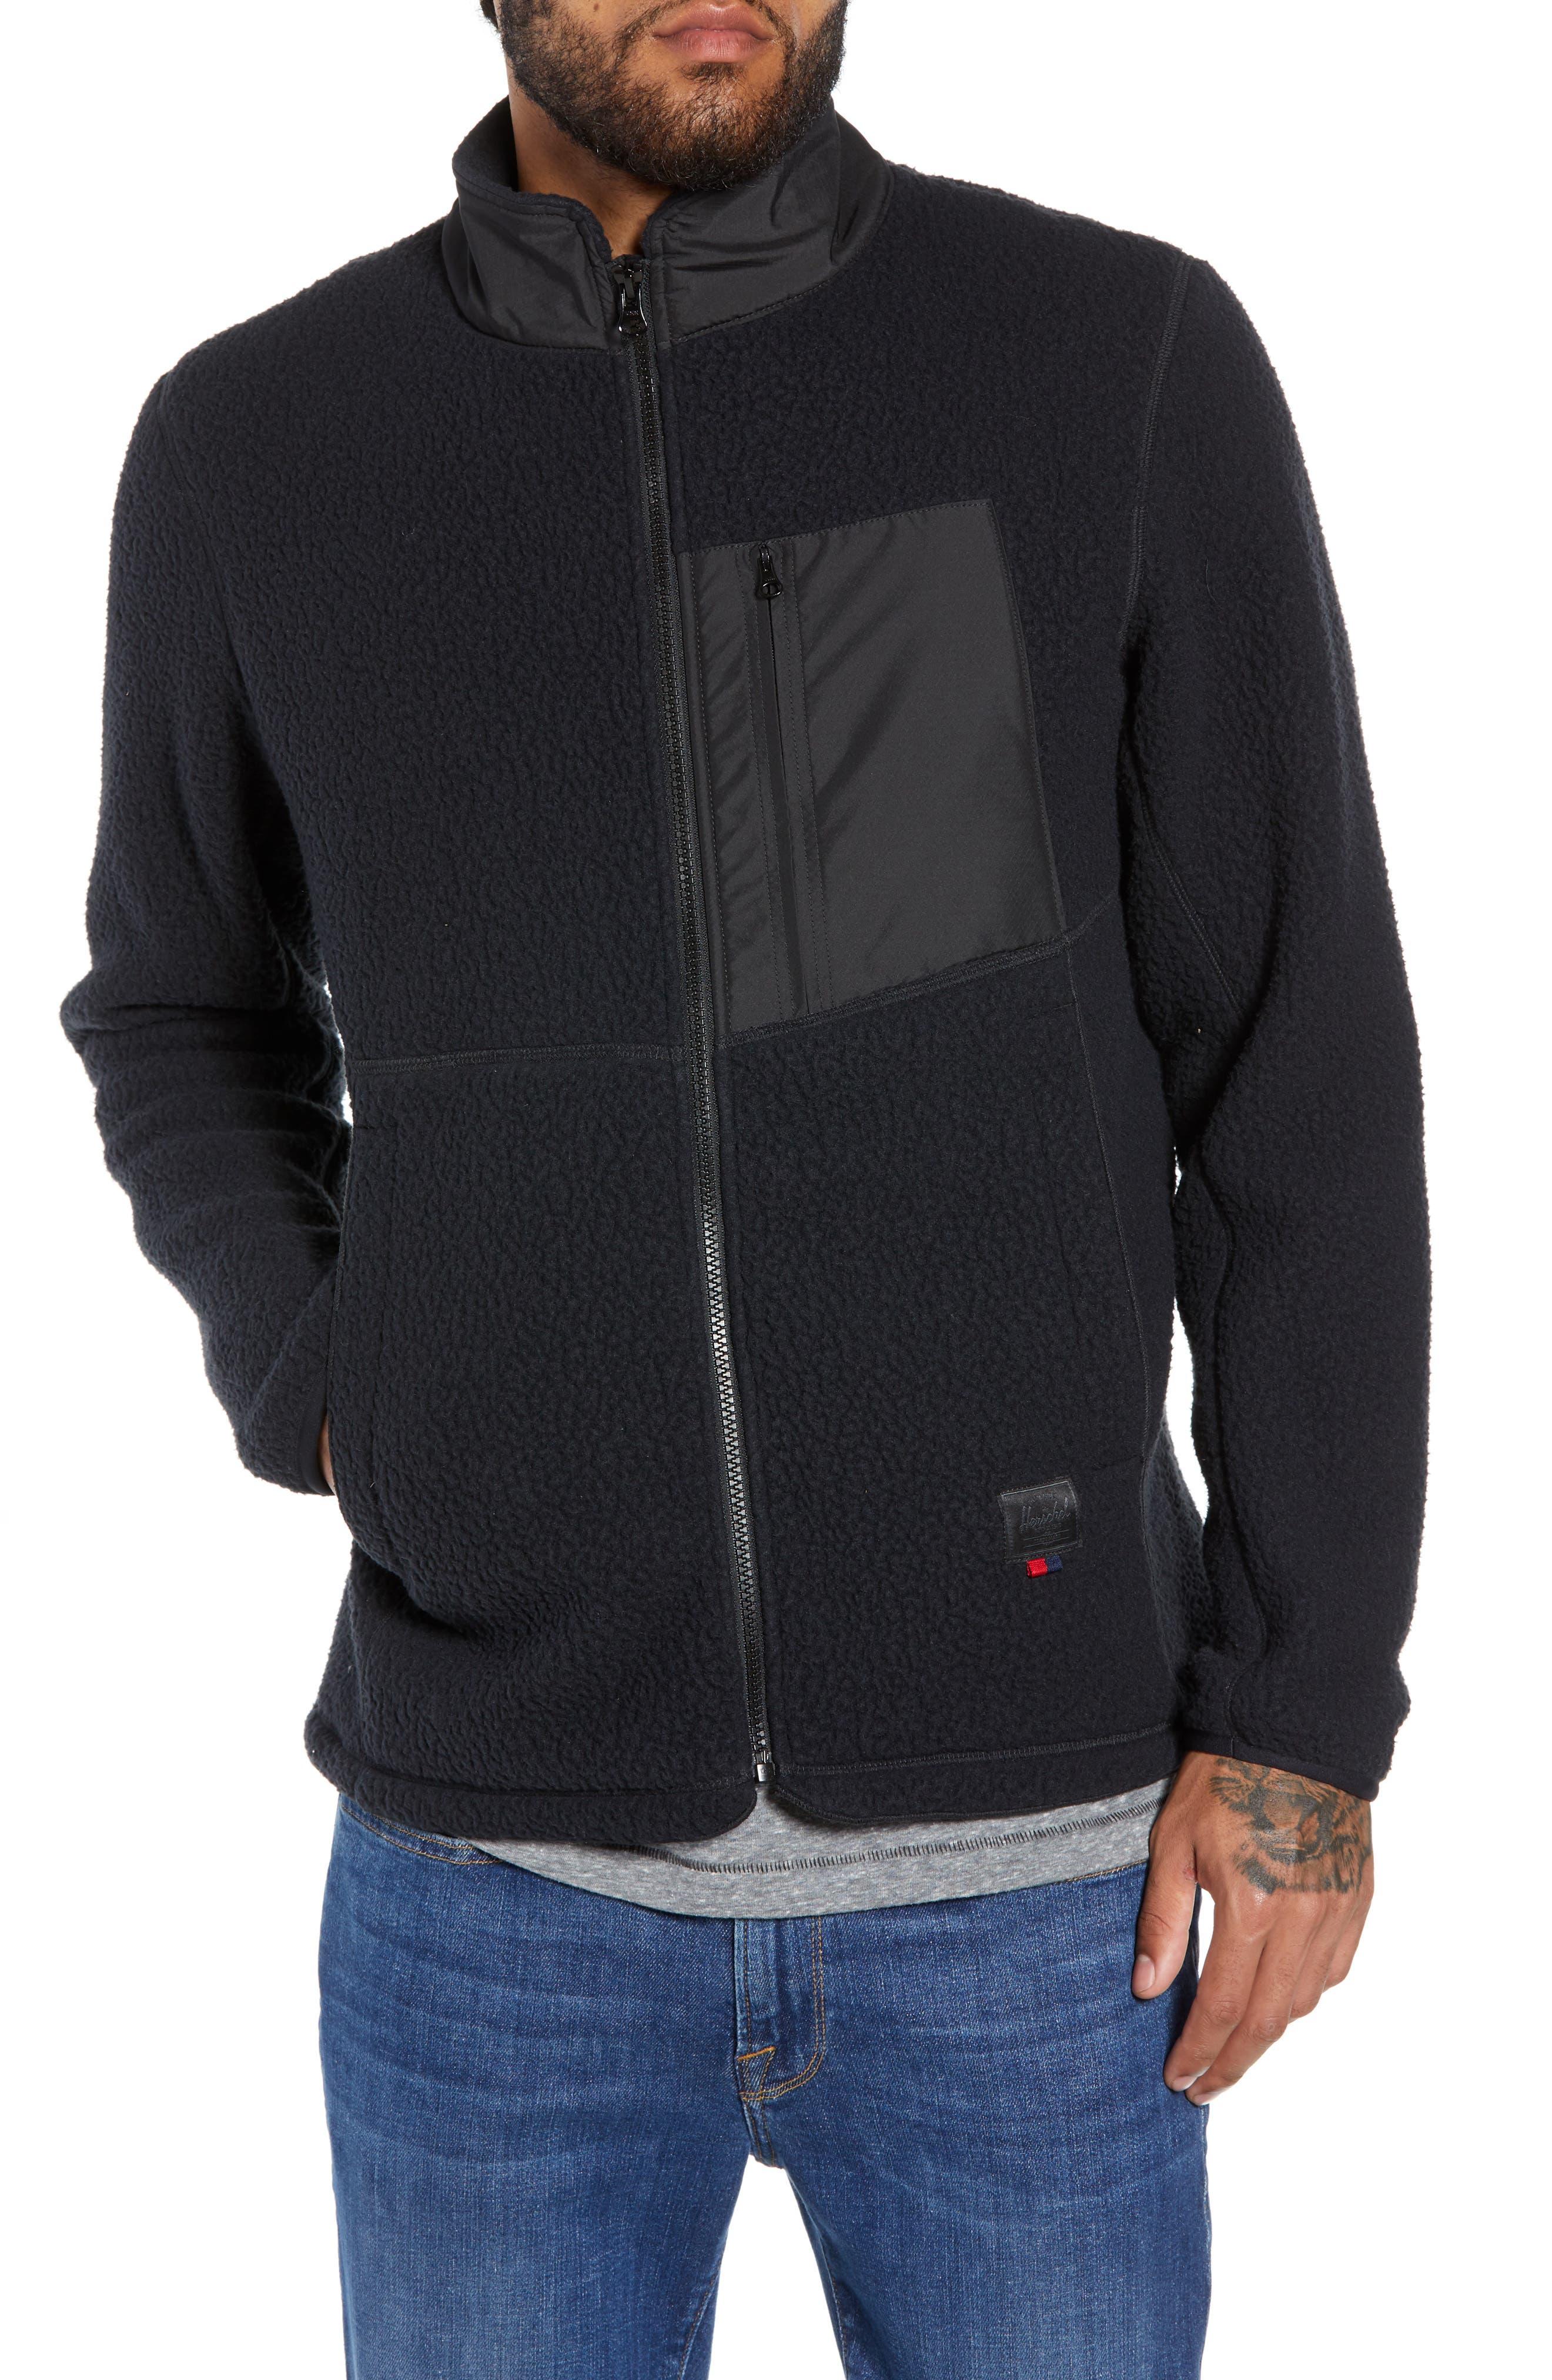 HERSCHEL SUPPLY CO.,                             Tech Fleece Jacket,                             Main thumbnail 1, color,                             001